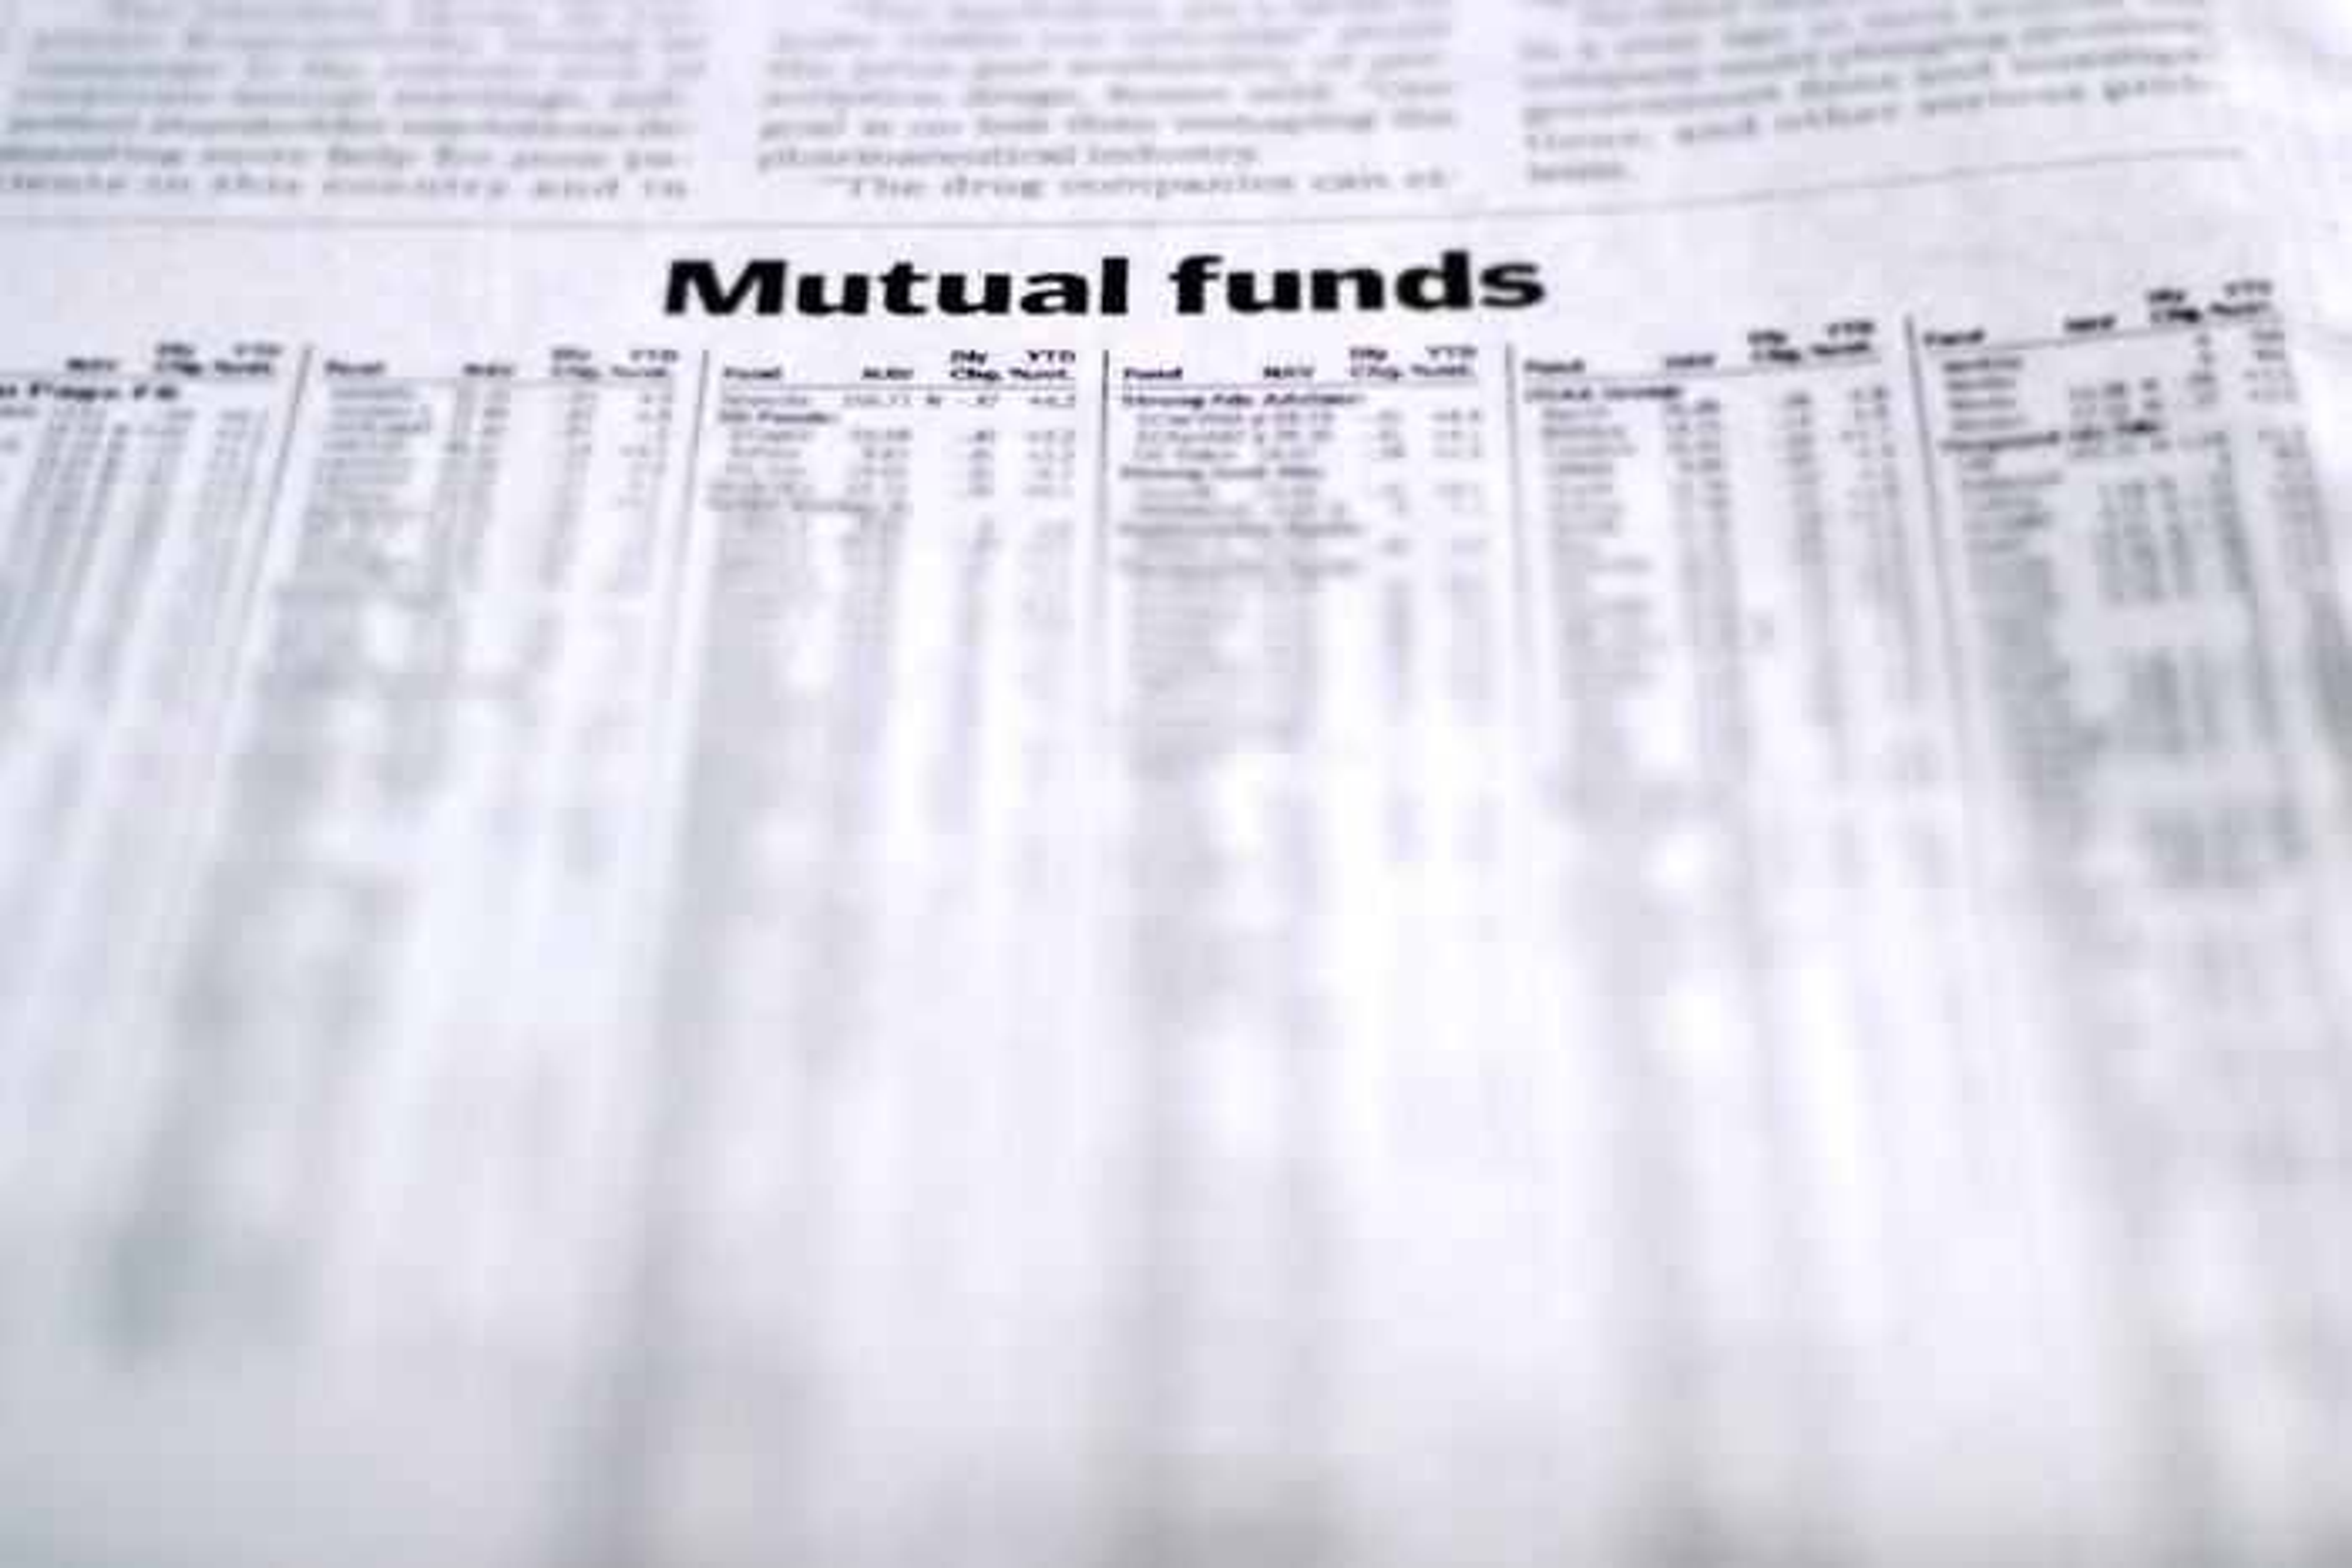 Mutual fund listings in a newspaper.